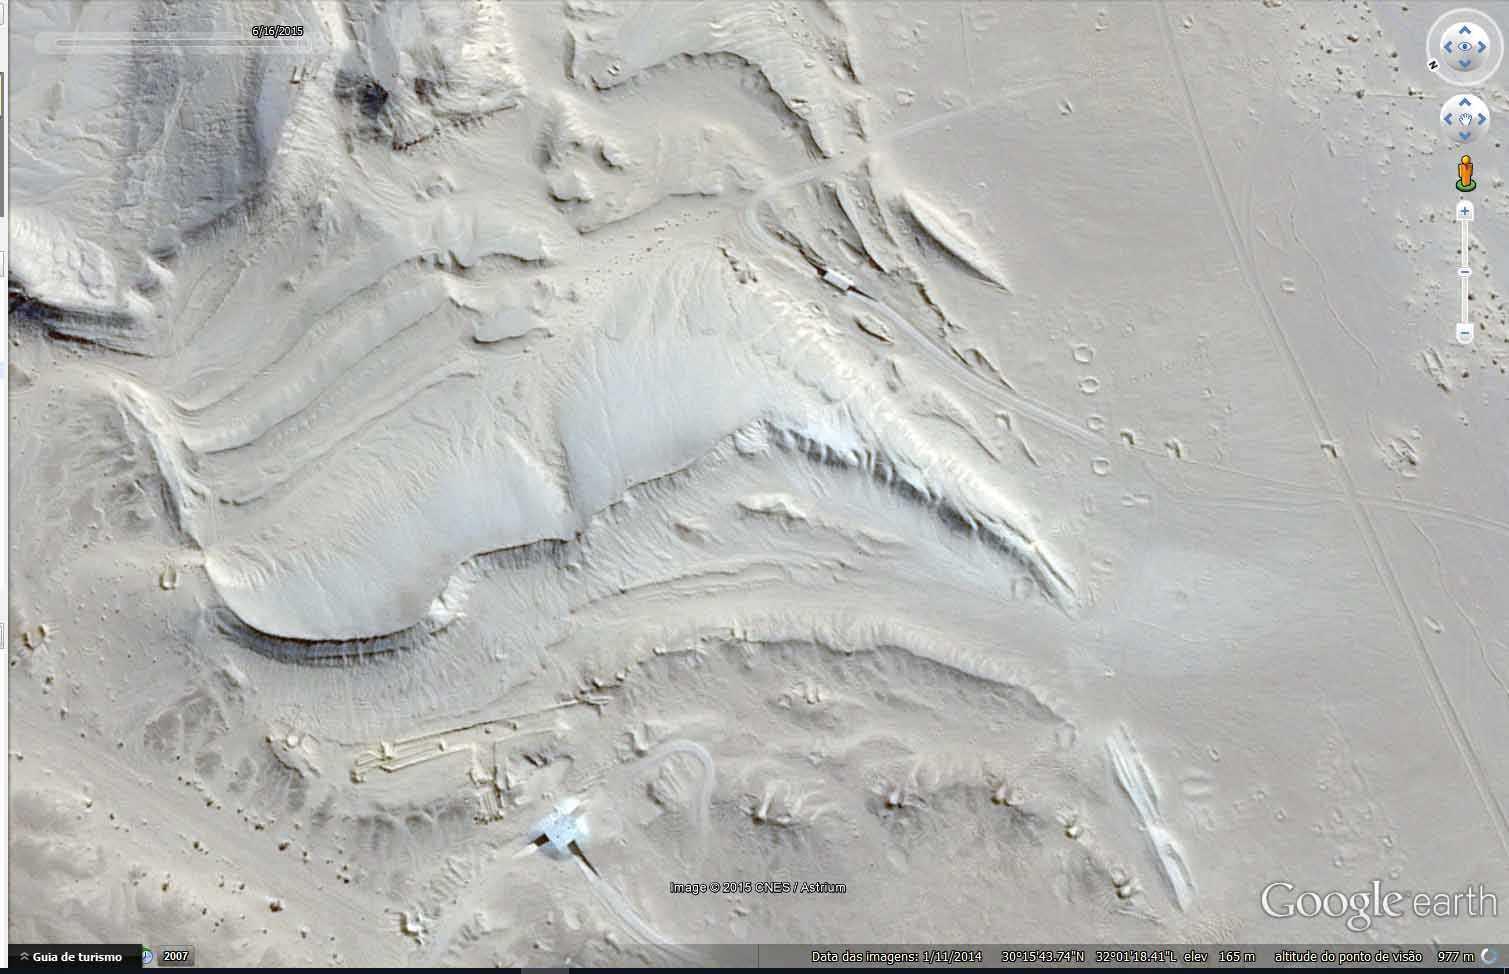 zonadomisterio4 Bases alienígenas? Estruturas misteriosas do deserto